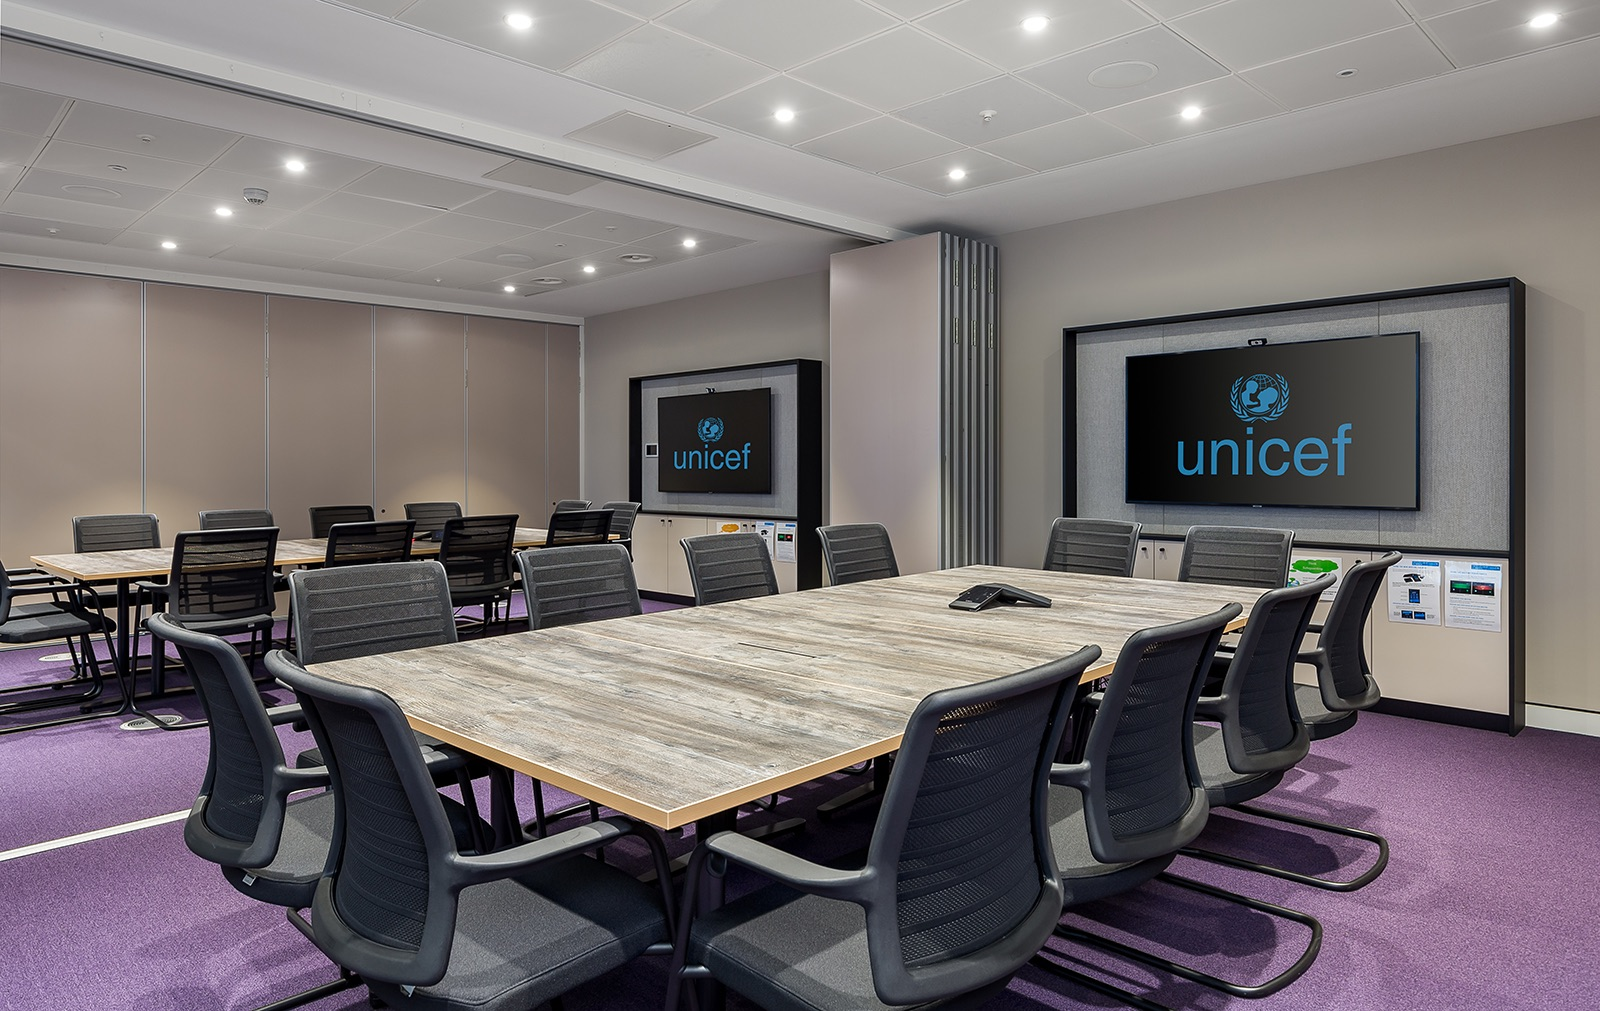 unicef-london-office-15